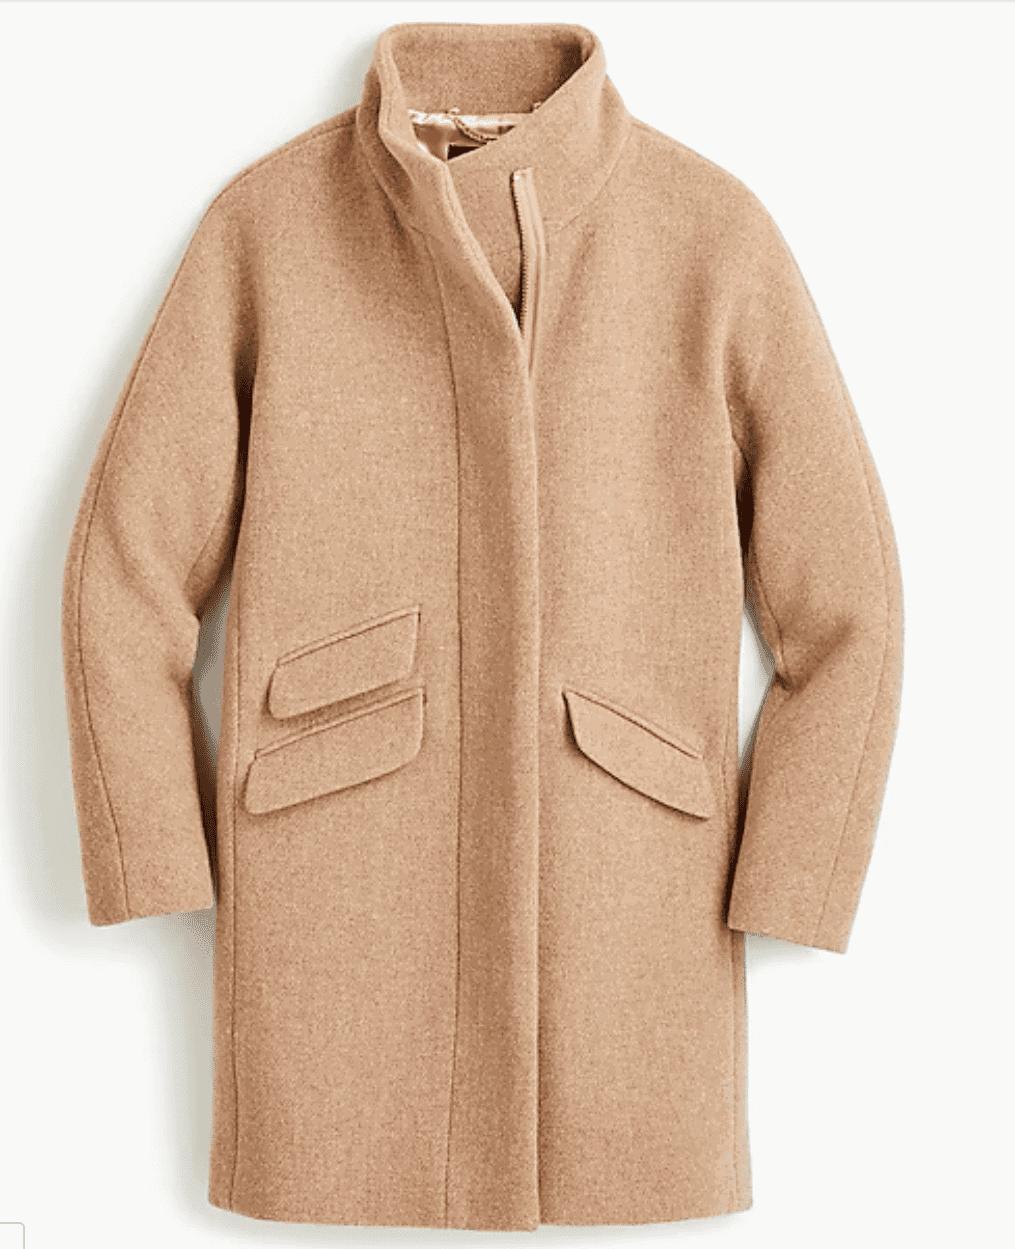 jcrew-coat